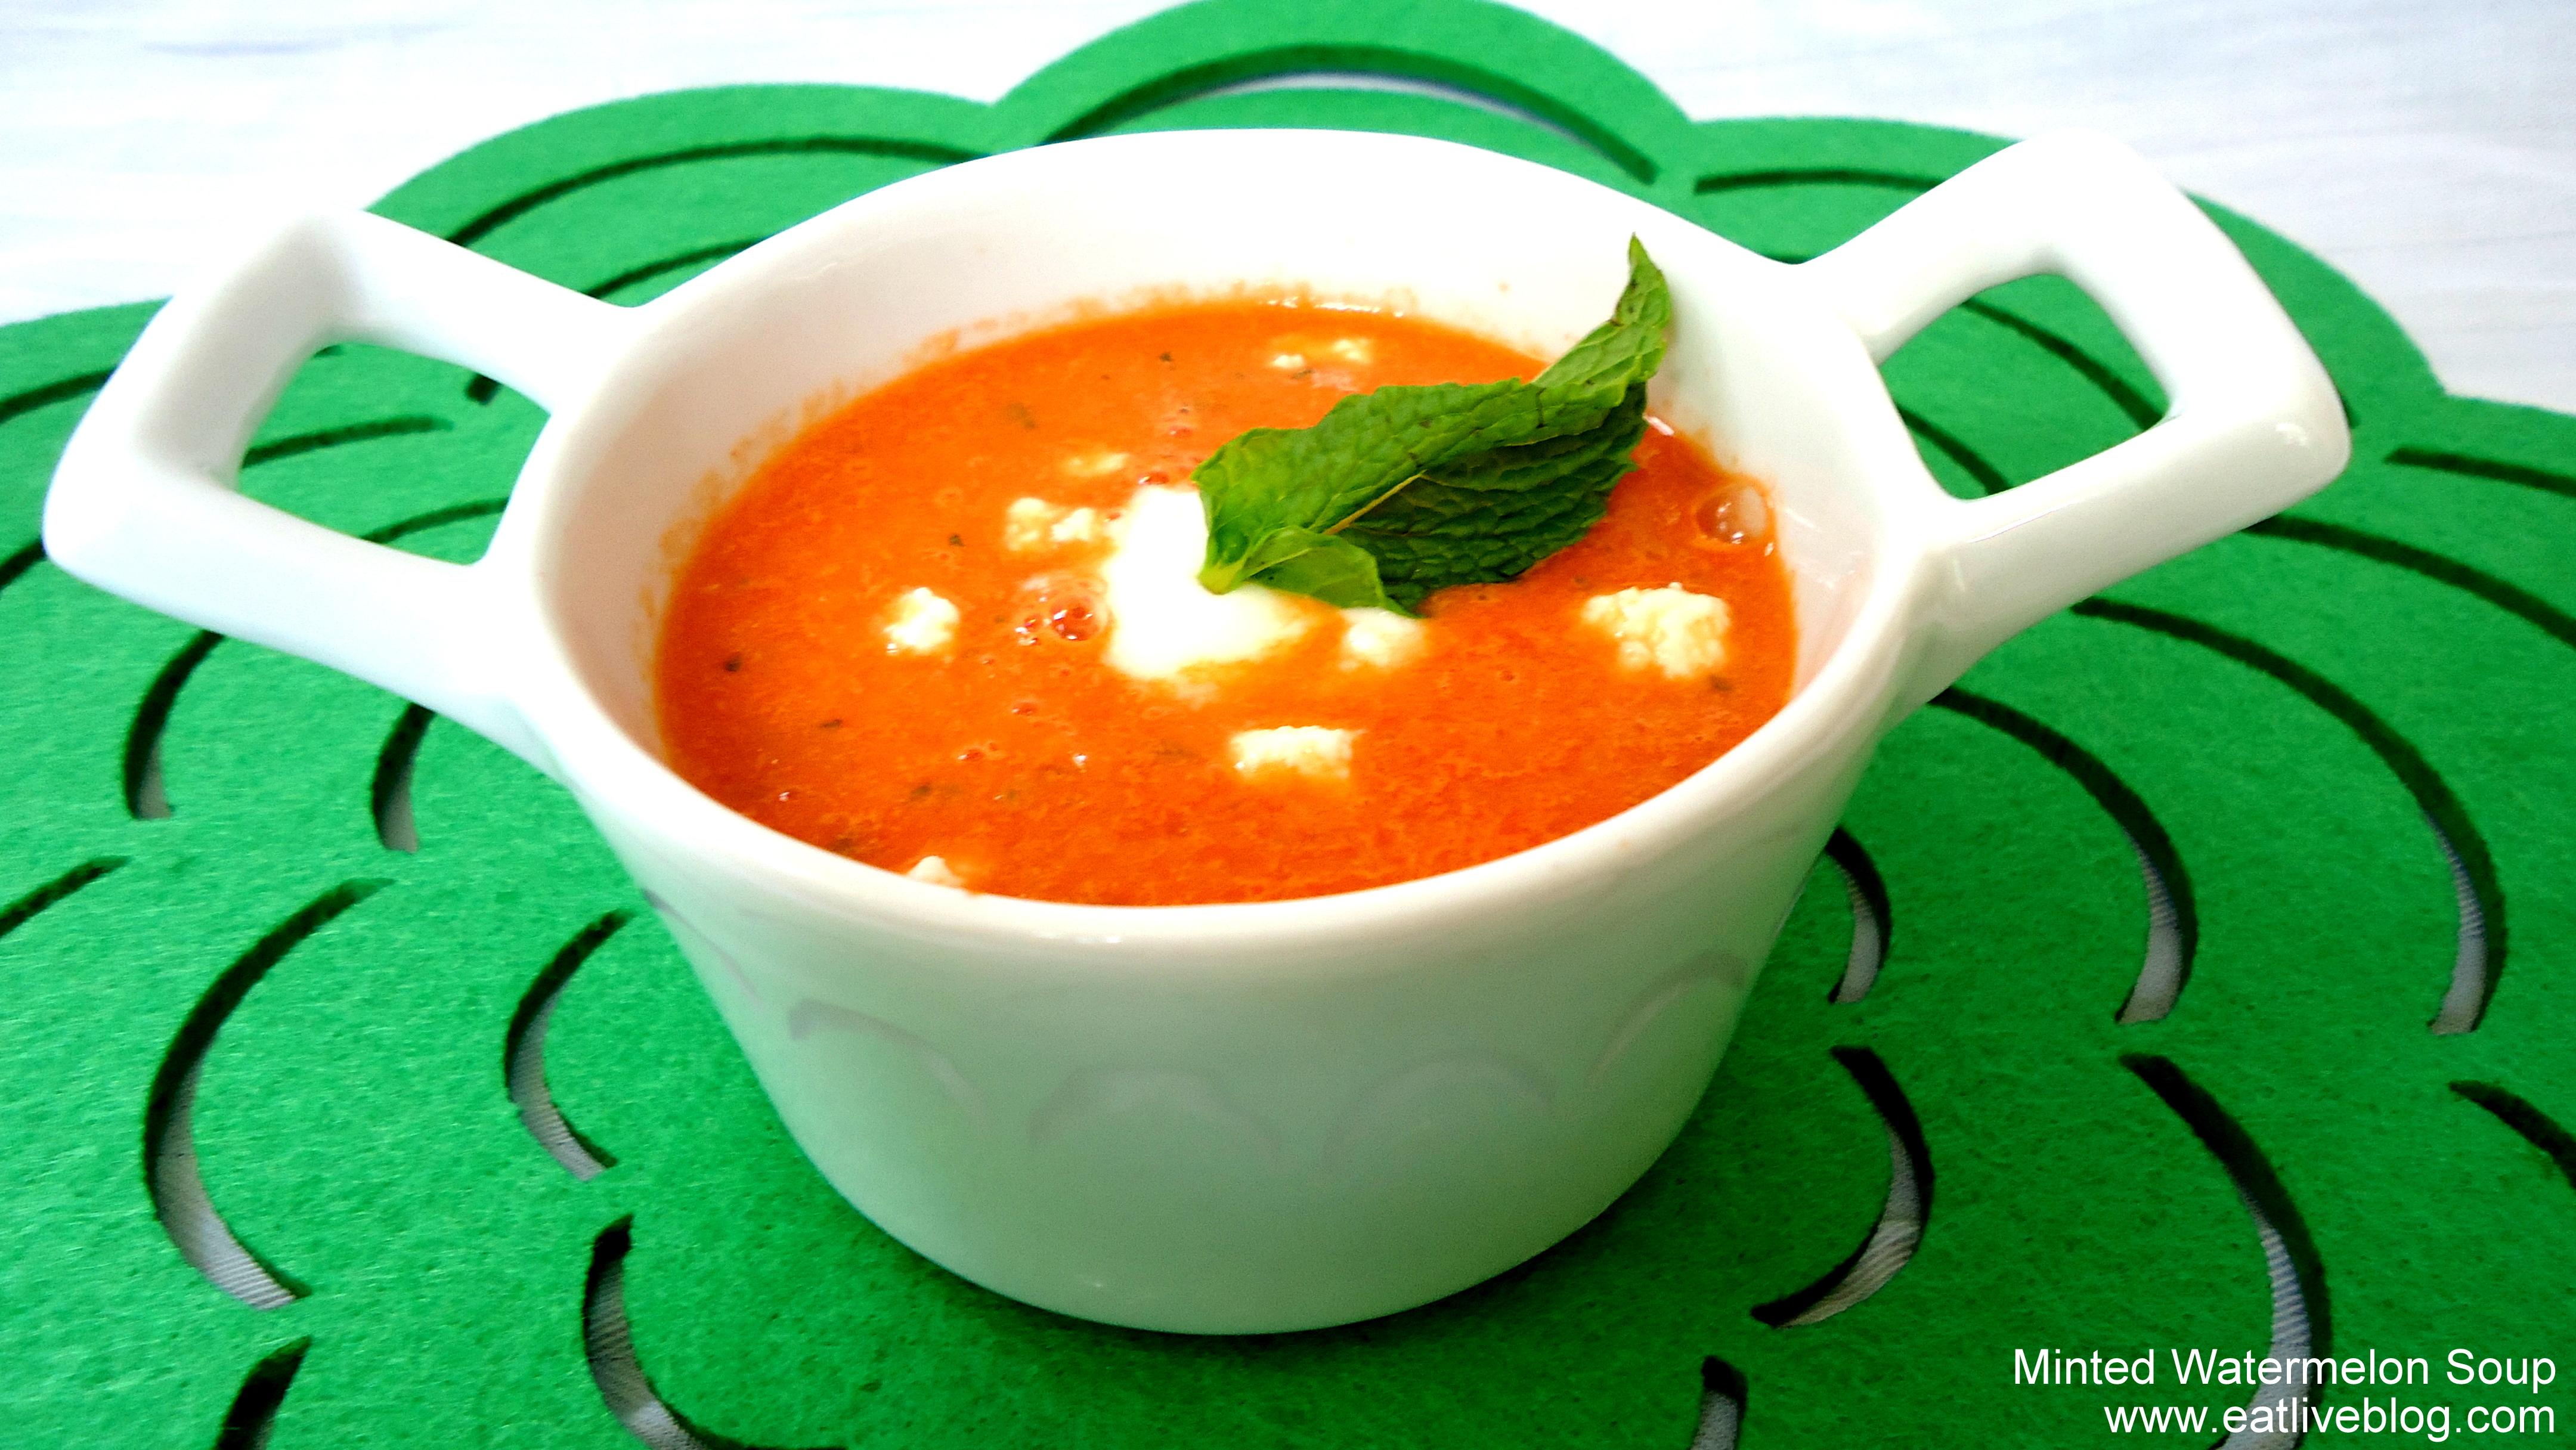 Chilled Minted Watermelon Soup Recipe #ColdSoupWeek | Eat.Live.Blog